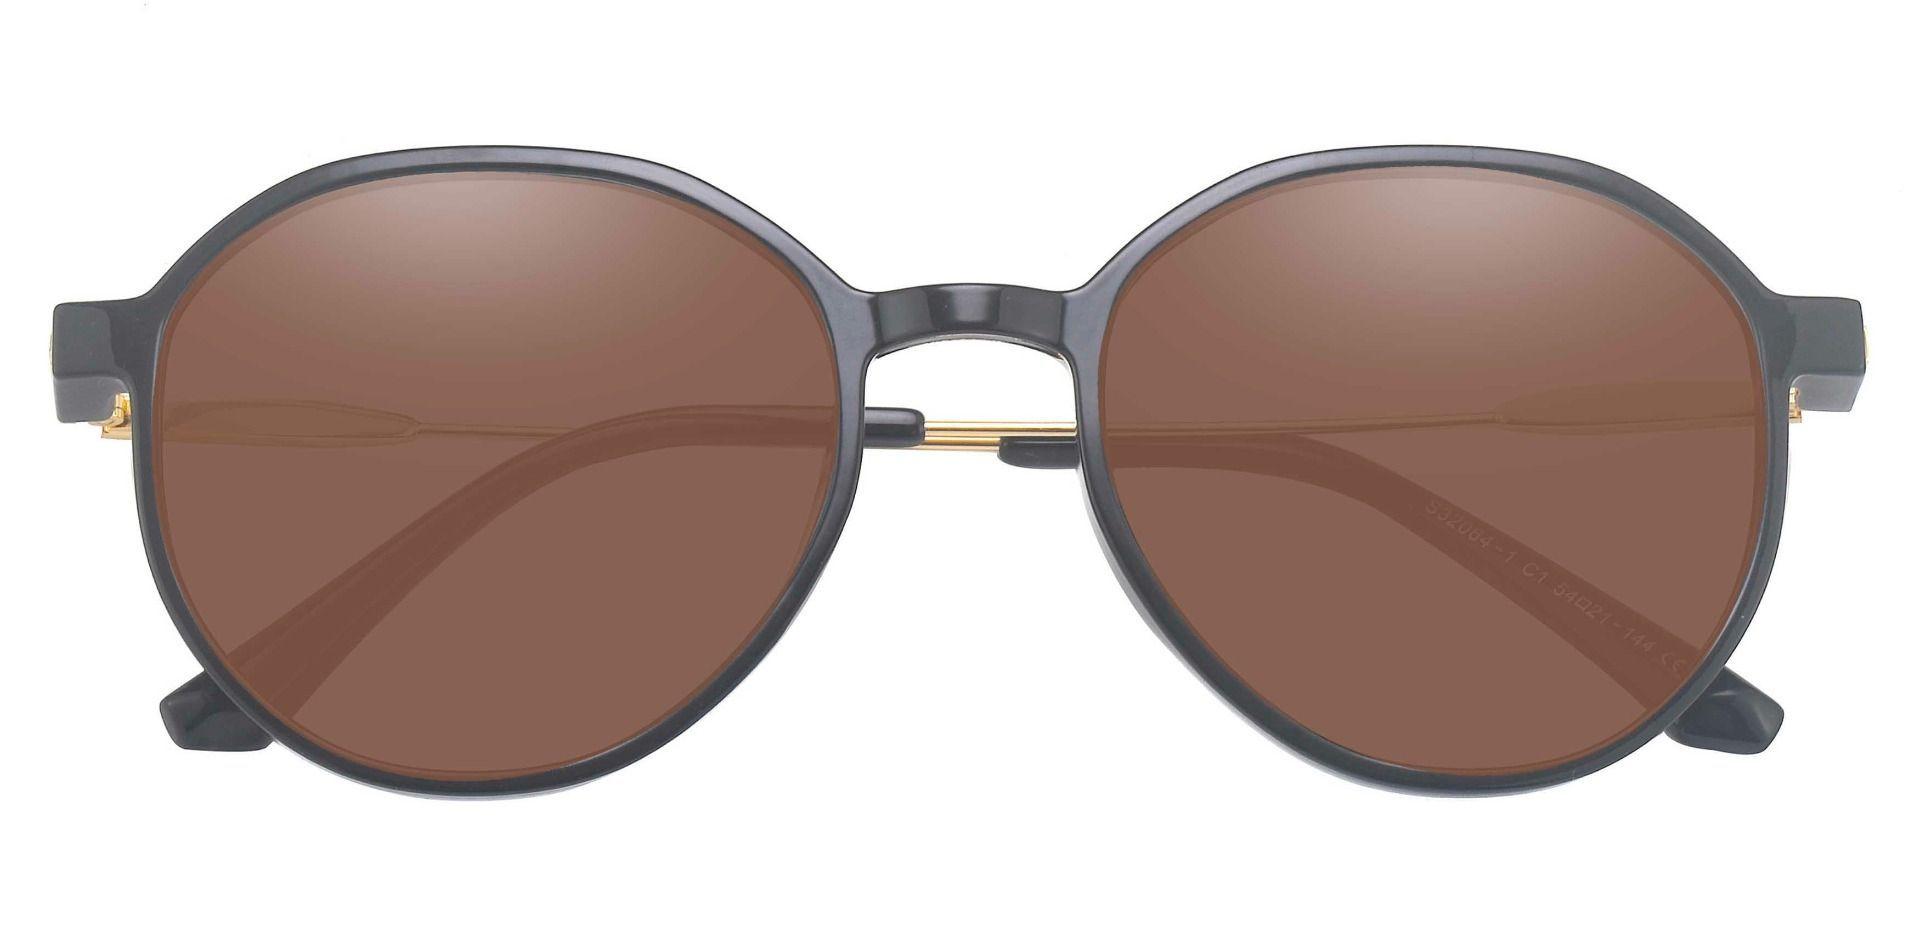 Daytona Geometric Lined Bifocal Sunglasses - Black Frame With Brown Lenses